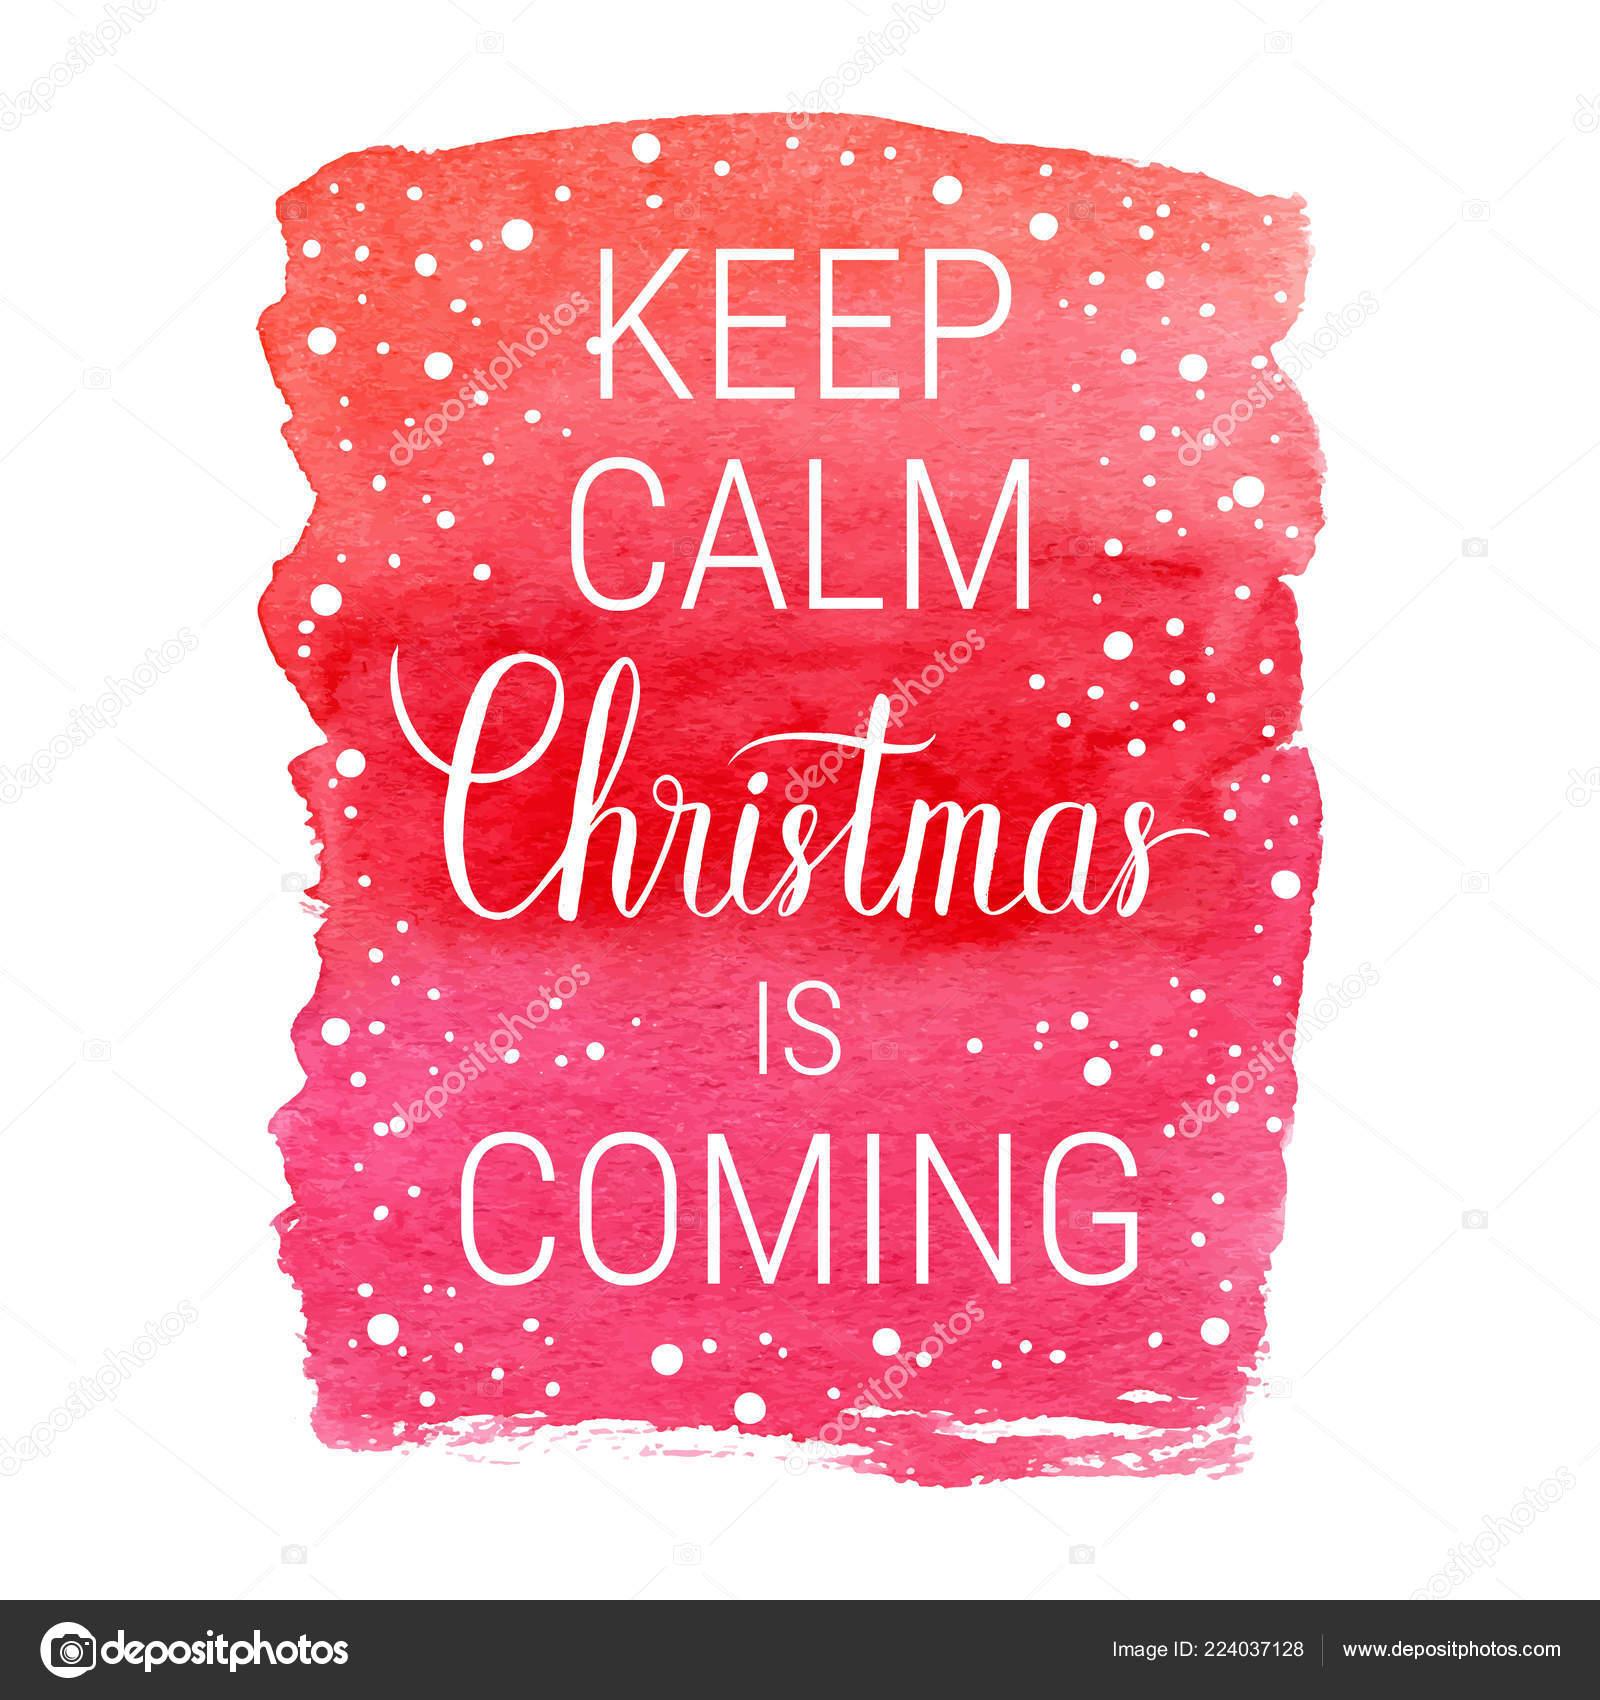 Keep Calm Christmas.Keep Calm Christmas Is Coming Keep Calm Christmas Coming